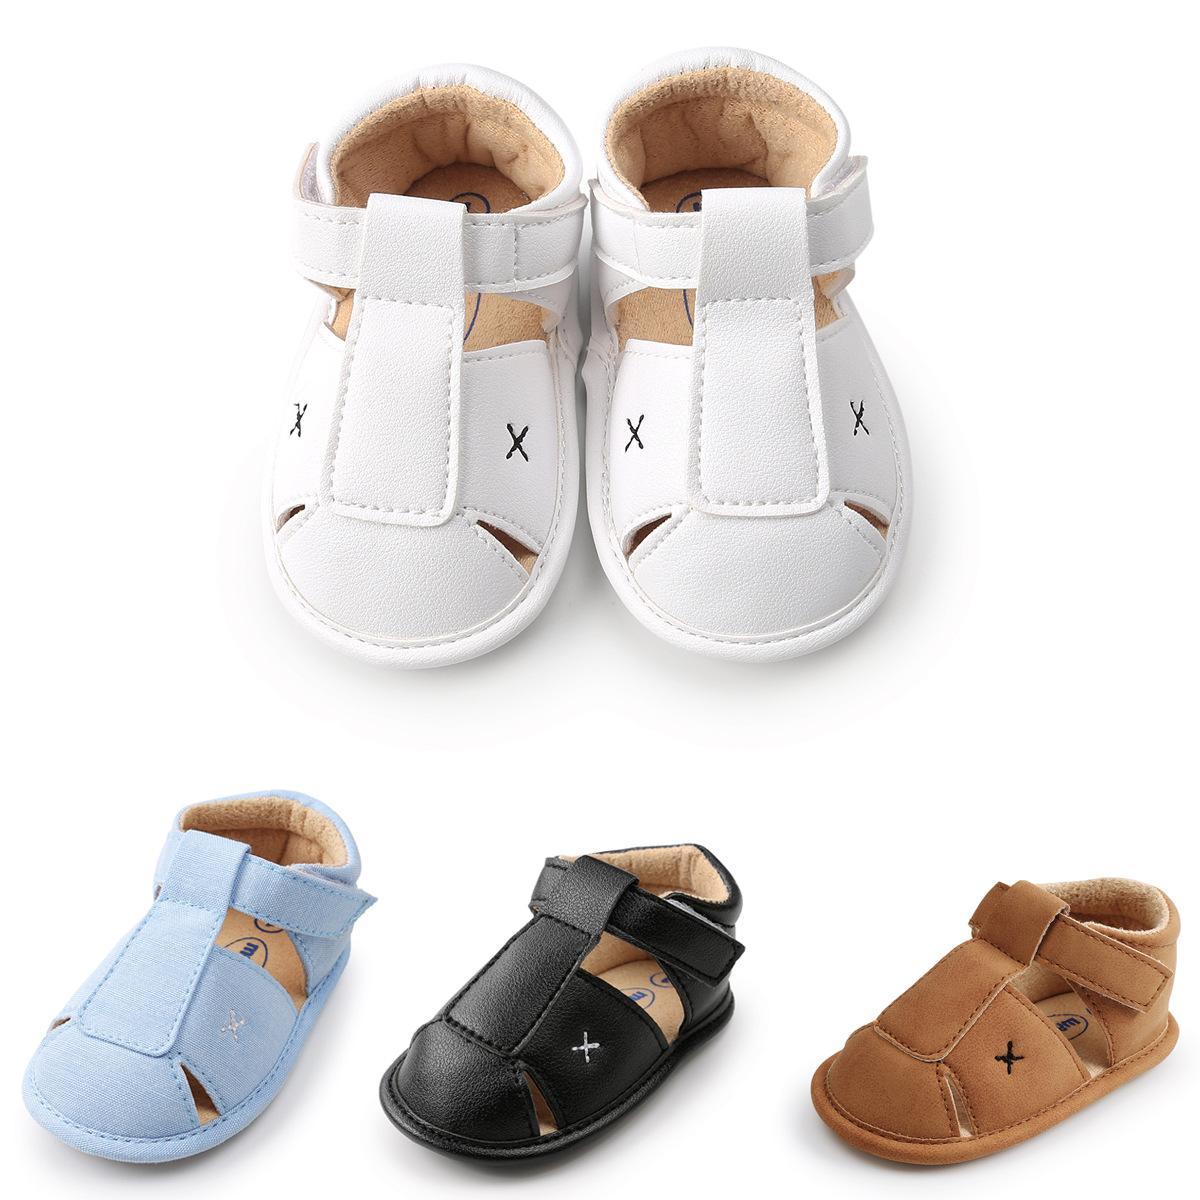 Summer Baby Boys Girls Sandals First Walkers Maluch Dzieci Soft Sole Antypoślizgowe PU Leather Crib Shoes